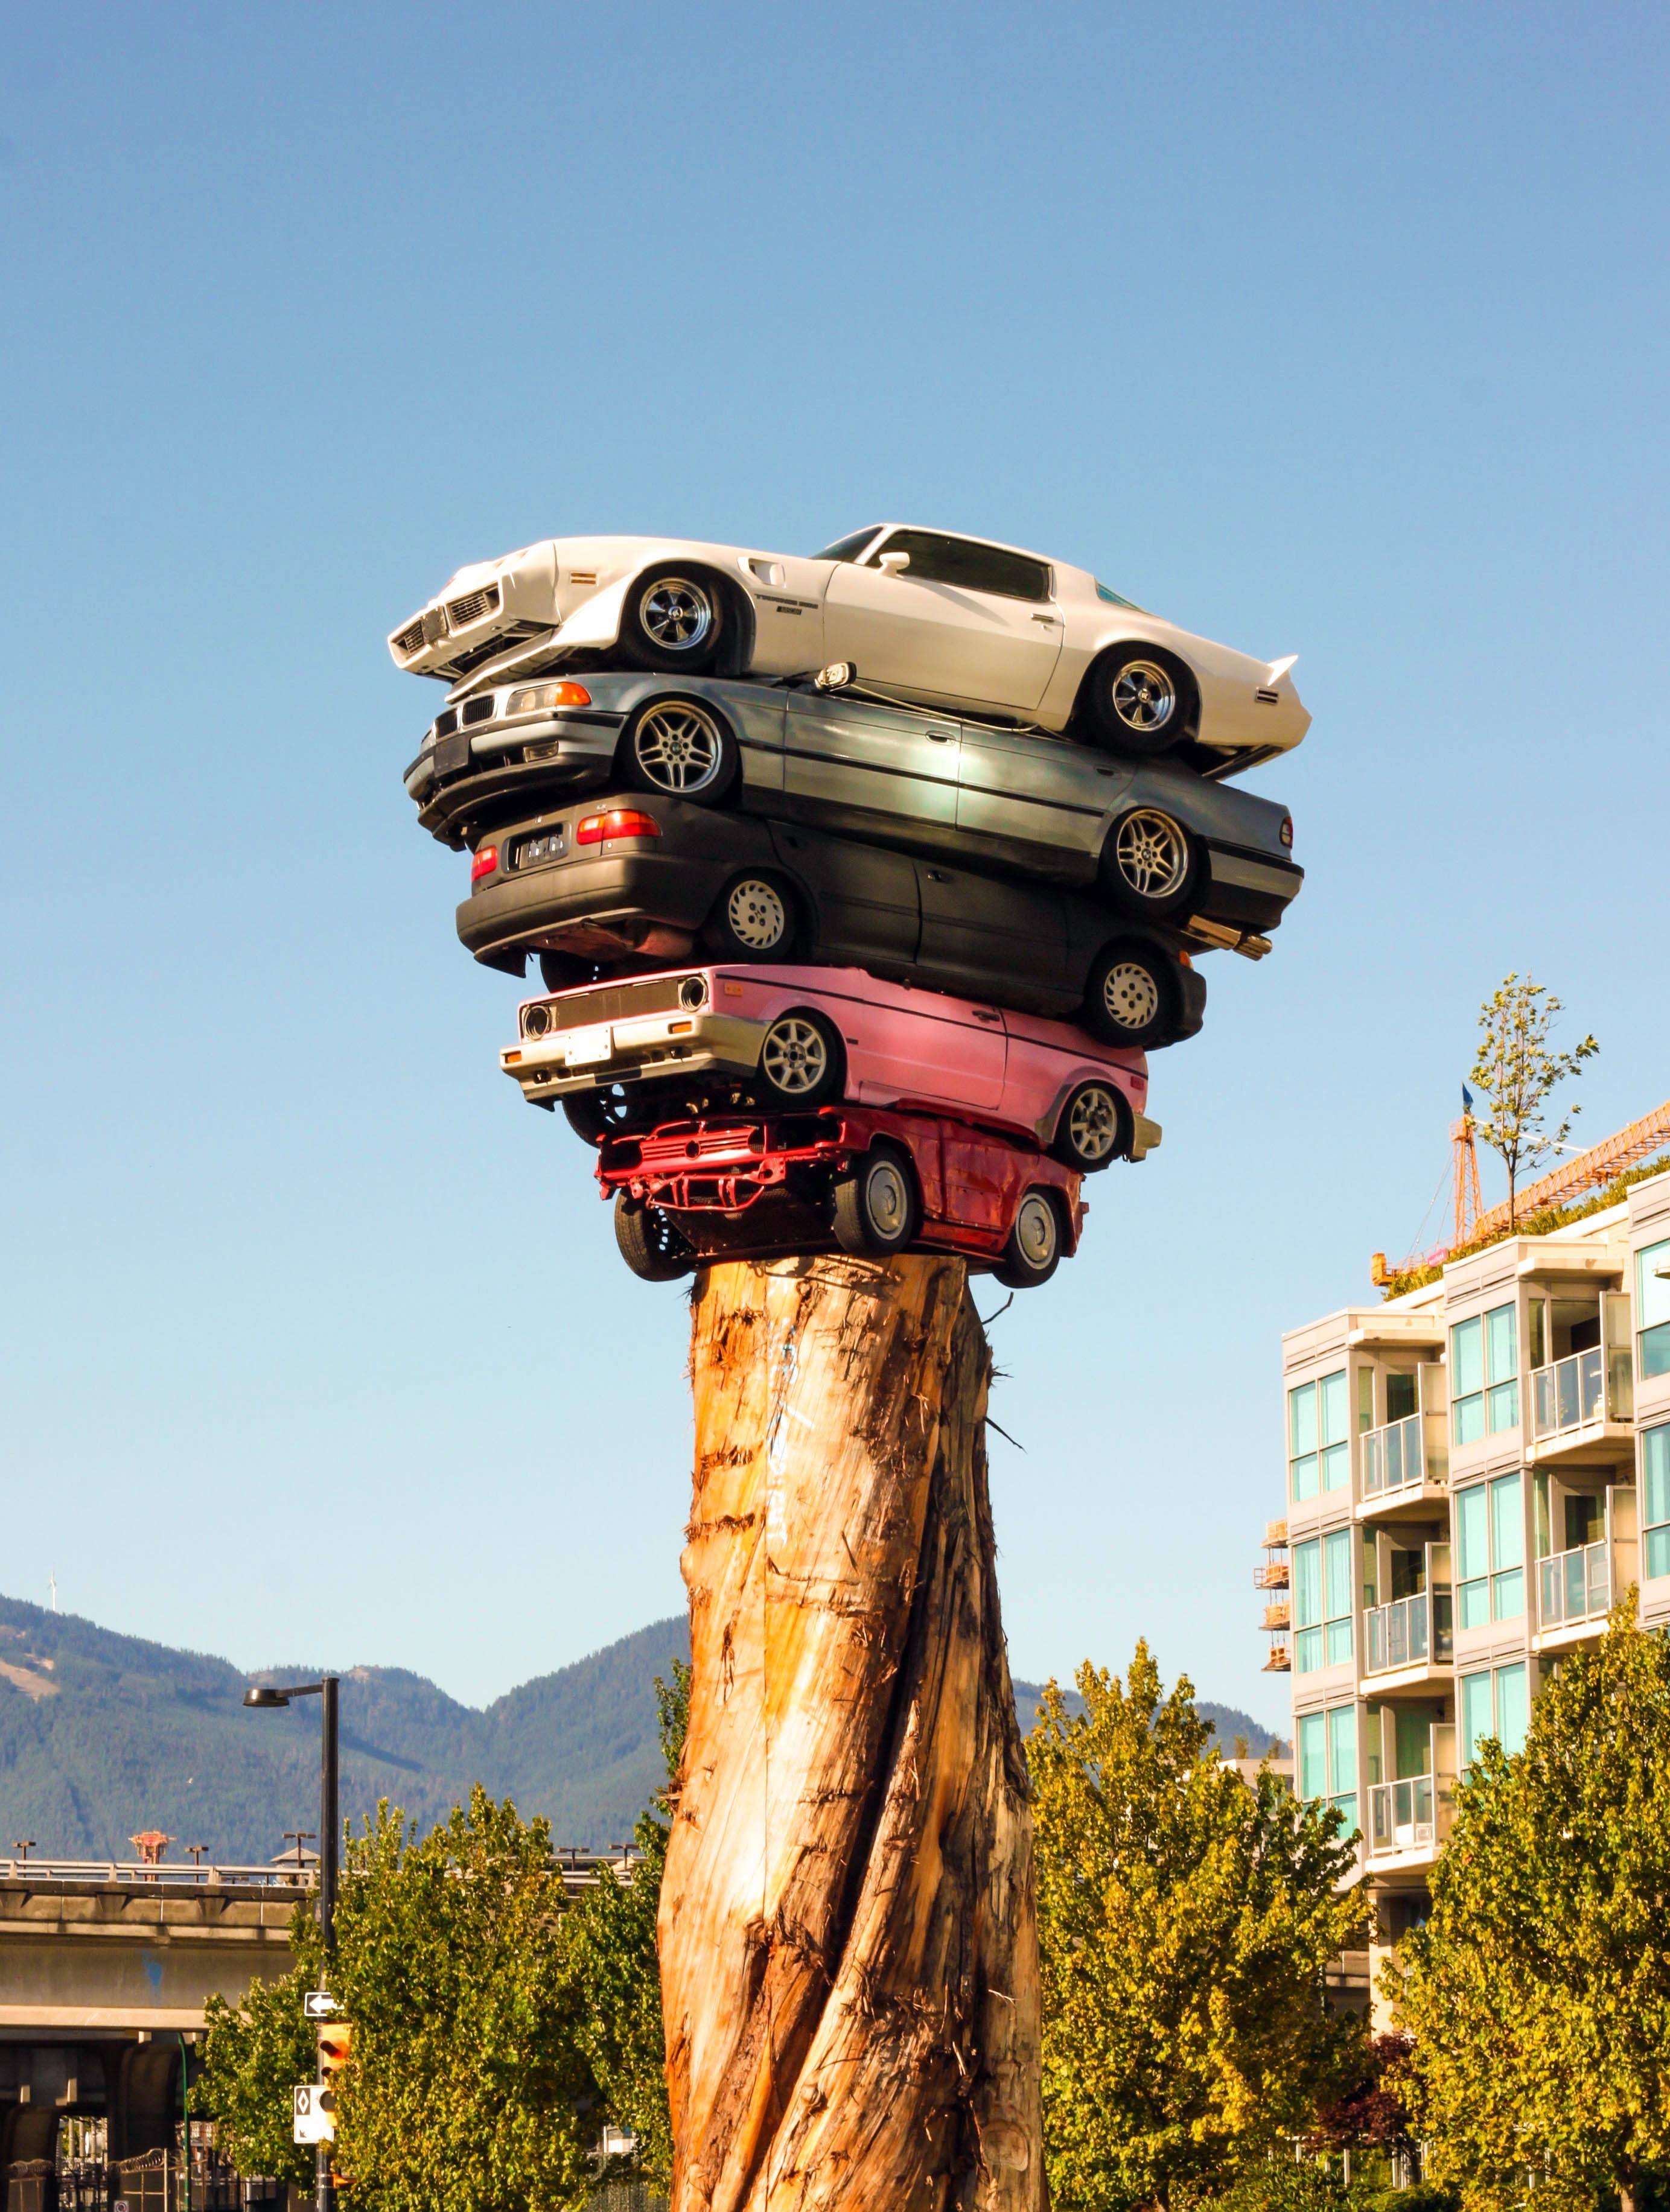 Tree Creative City Urban Statue Decoration Amusement Park Tower Park  Artistic Landmark Modern Artwork Totem Pole